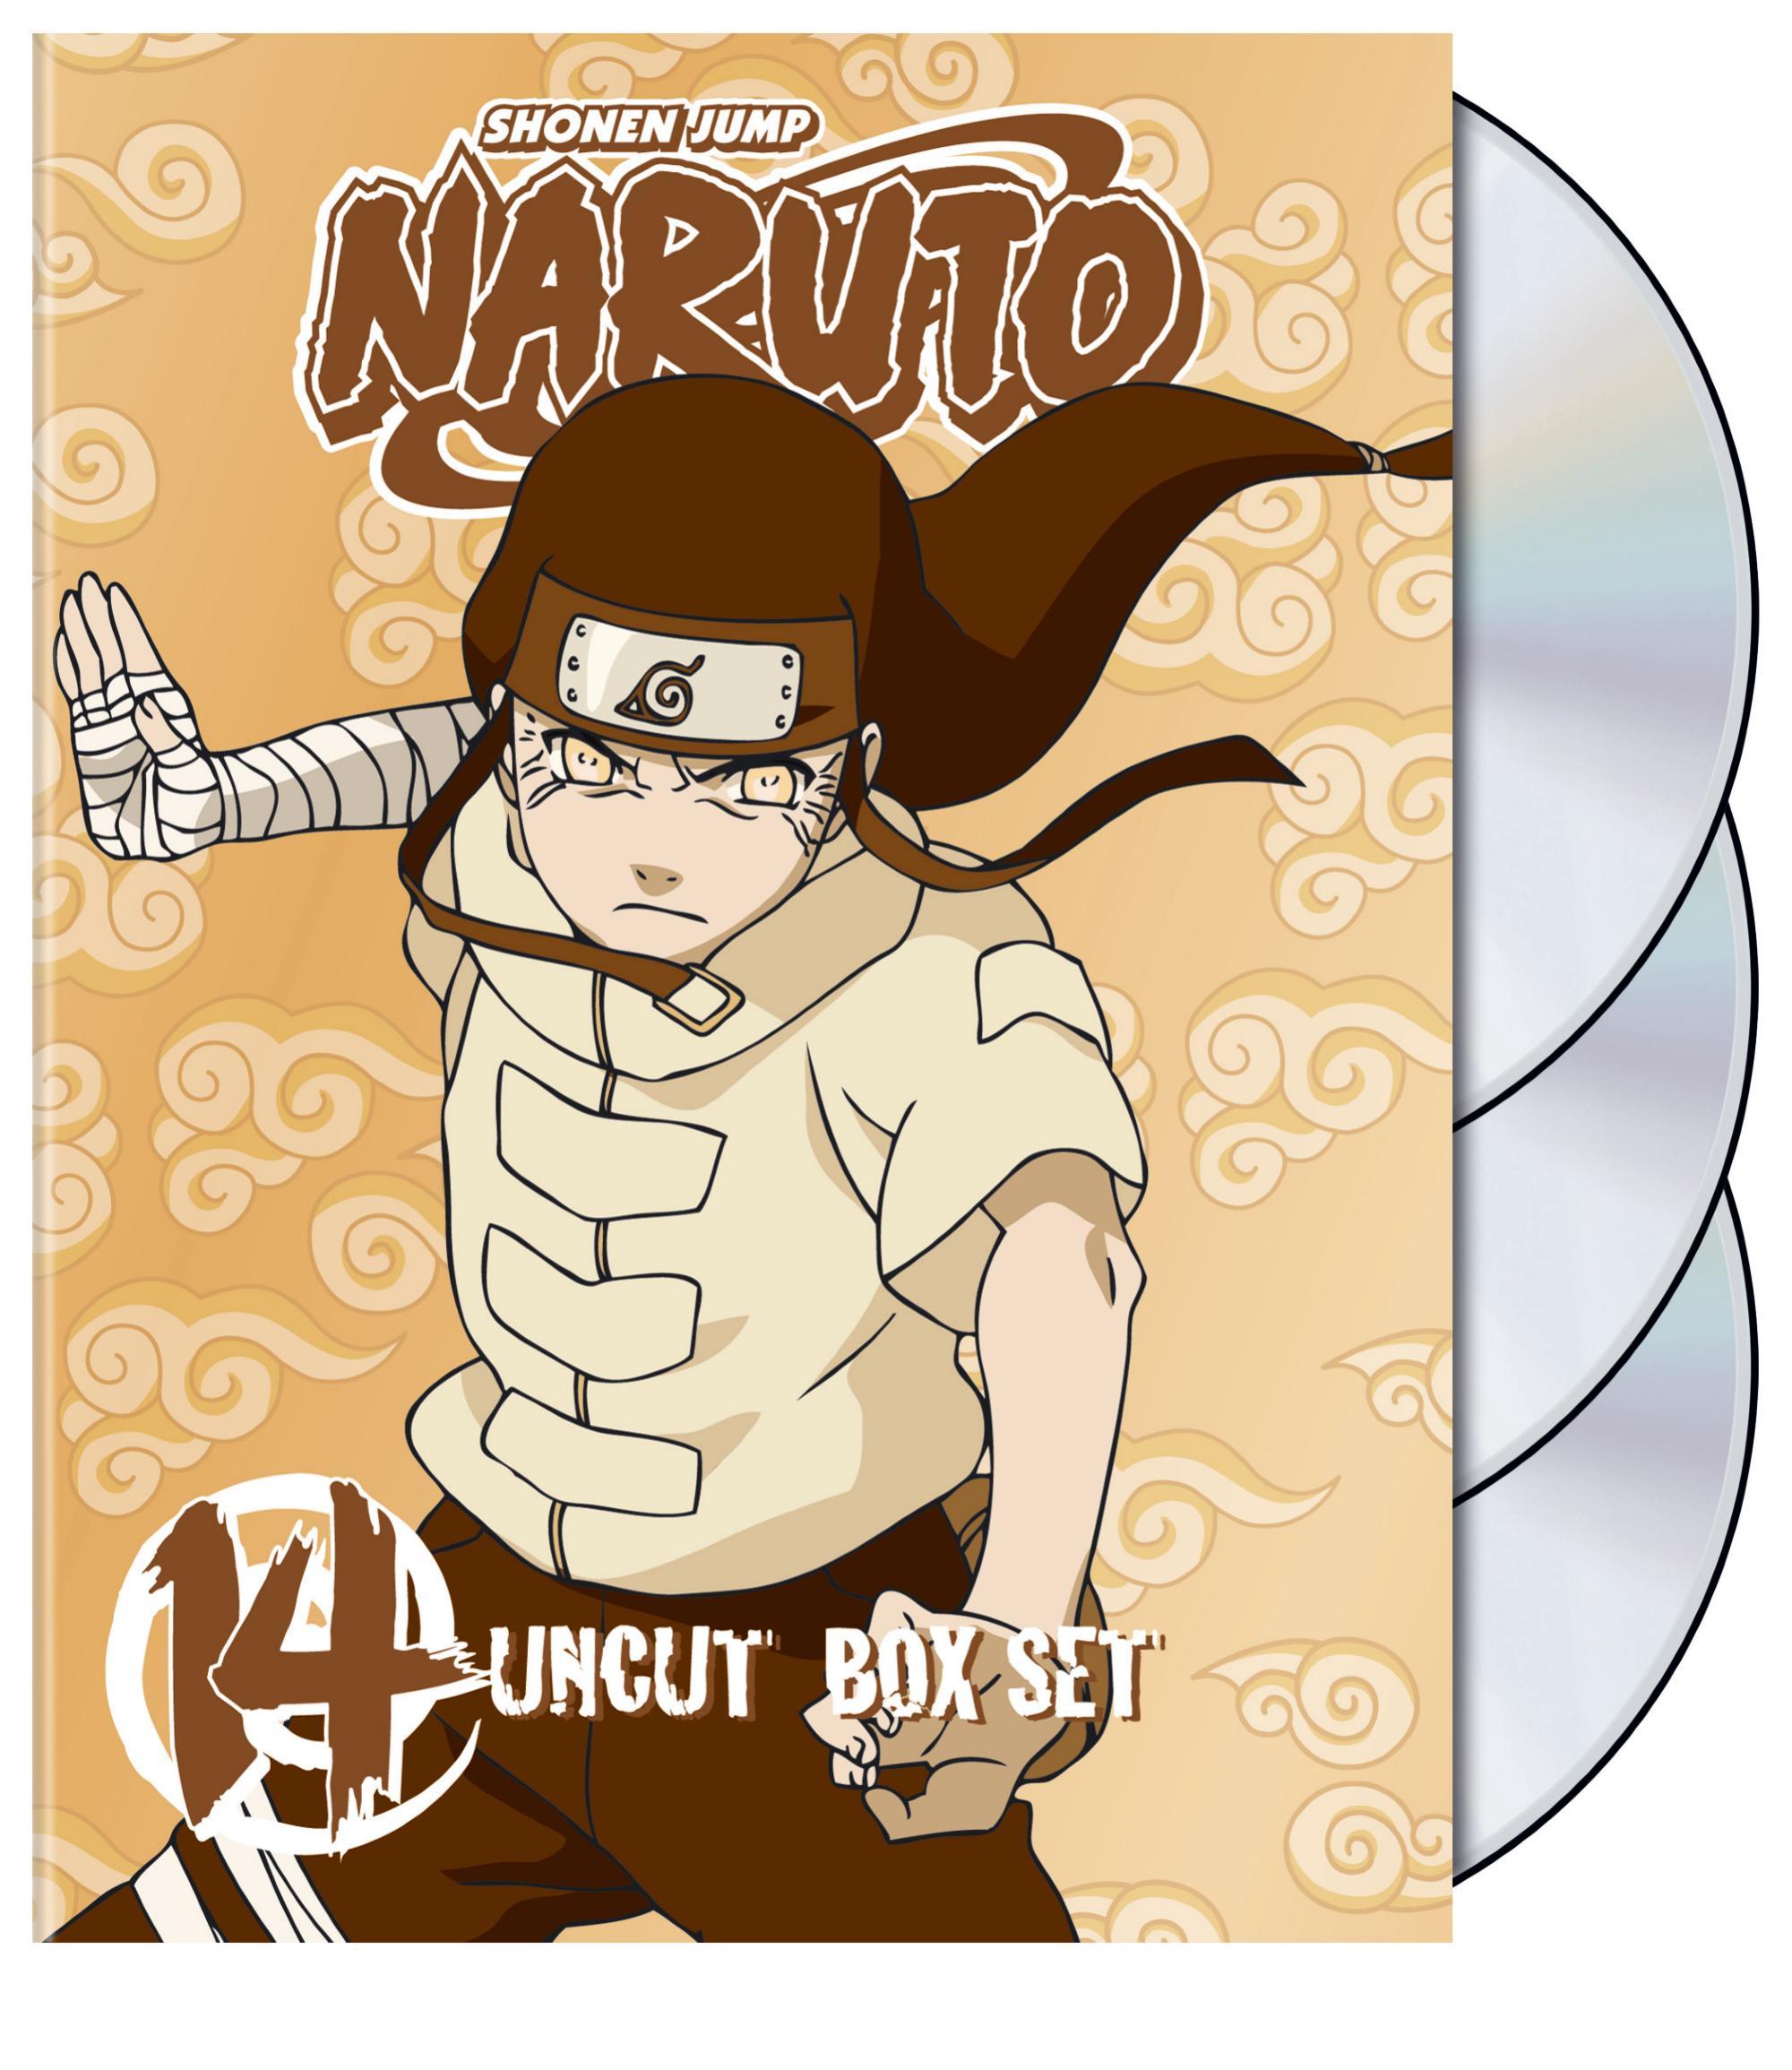 Naruto Uncut Box Set Vol 14 (Special Edition) (DVD)